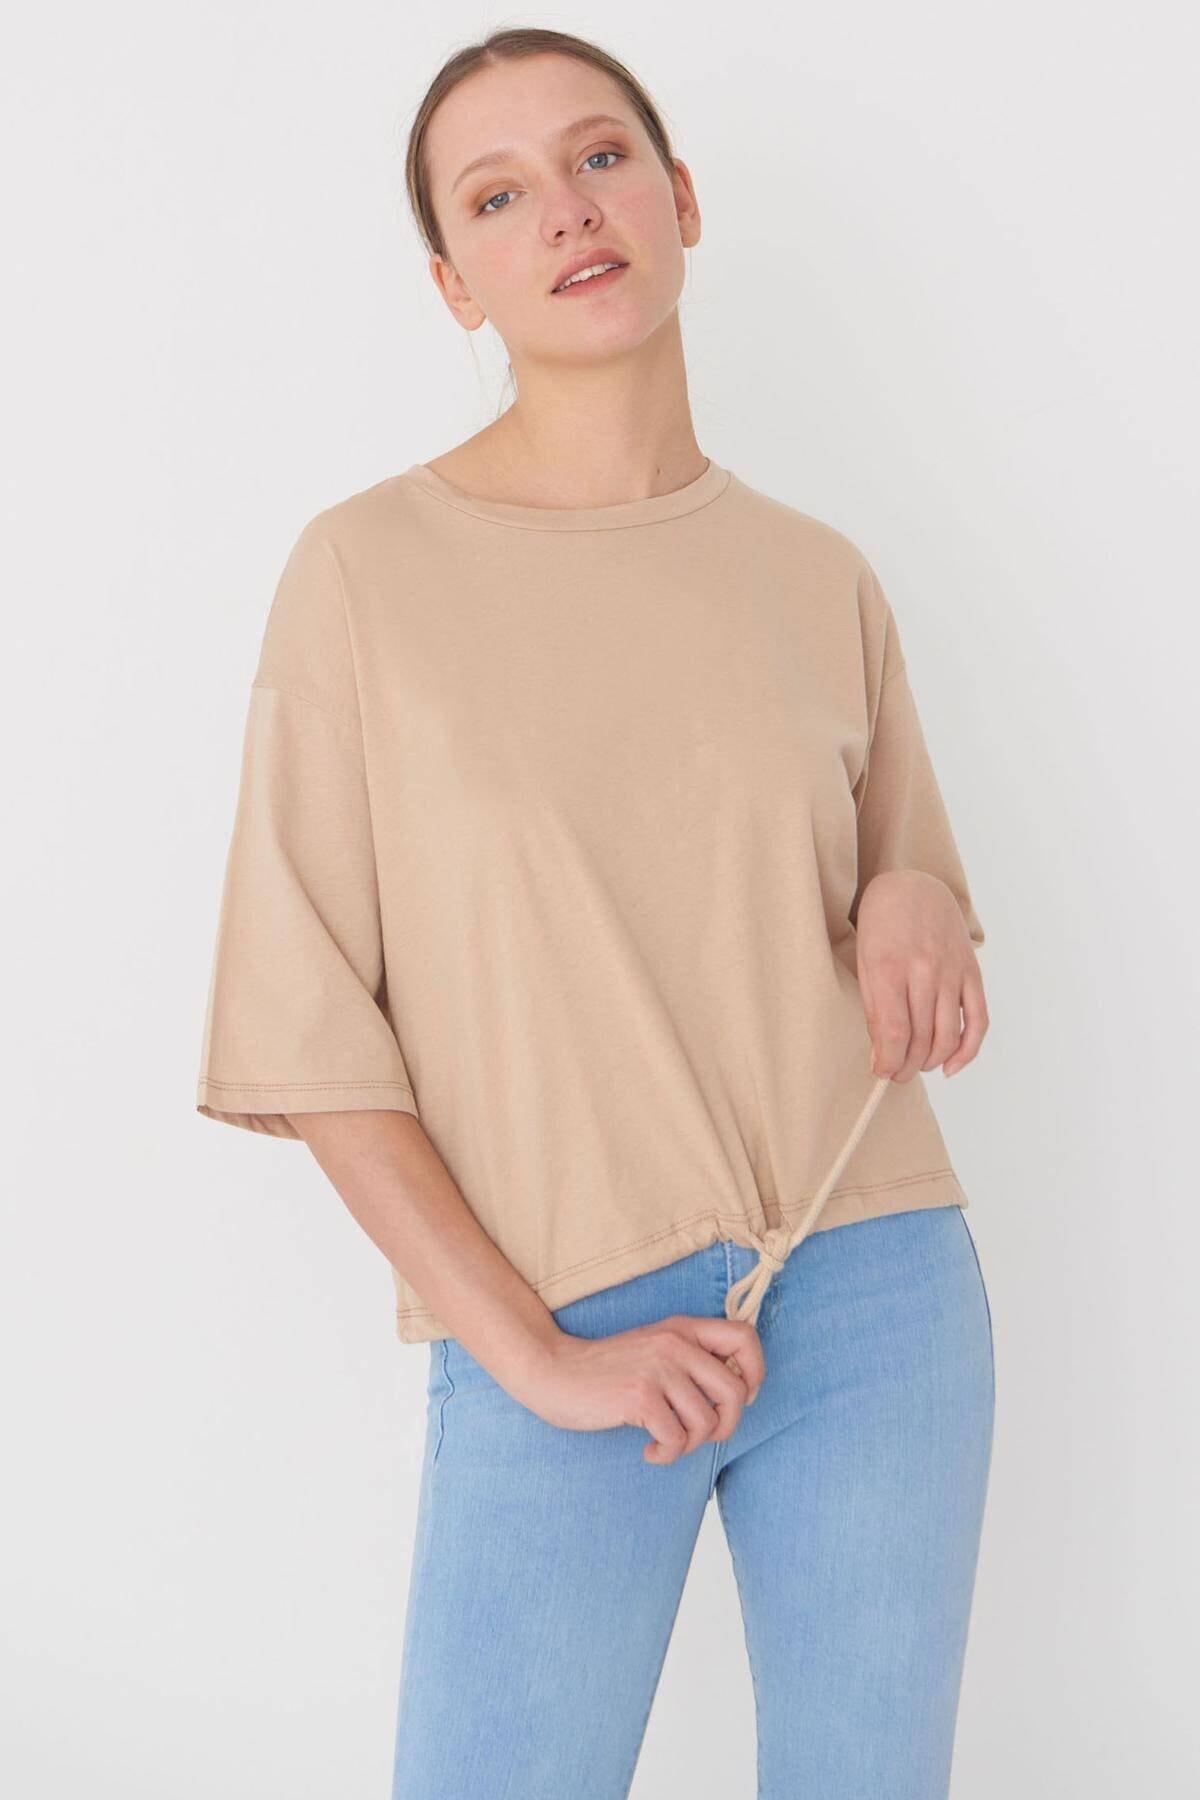 Addax Kadın Kahve Basic T-Shirt P6235 - İ3 Adx-0000023817